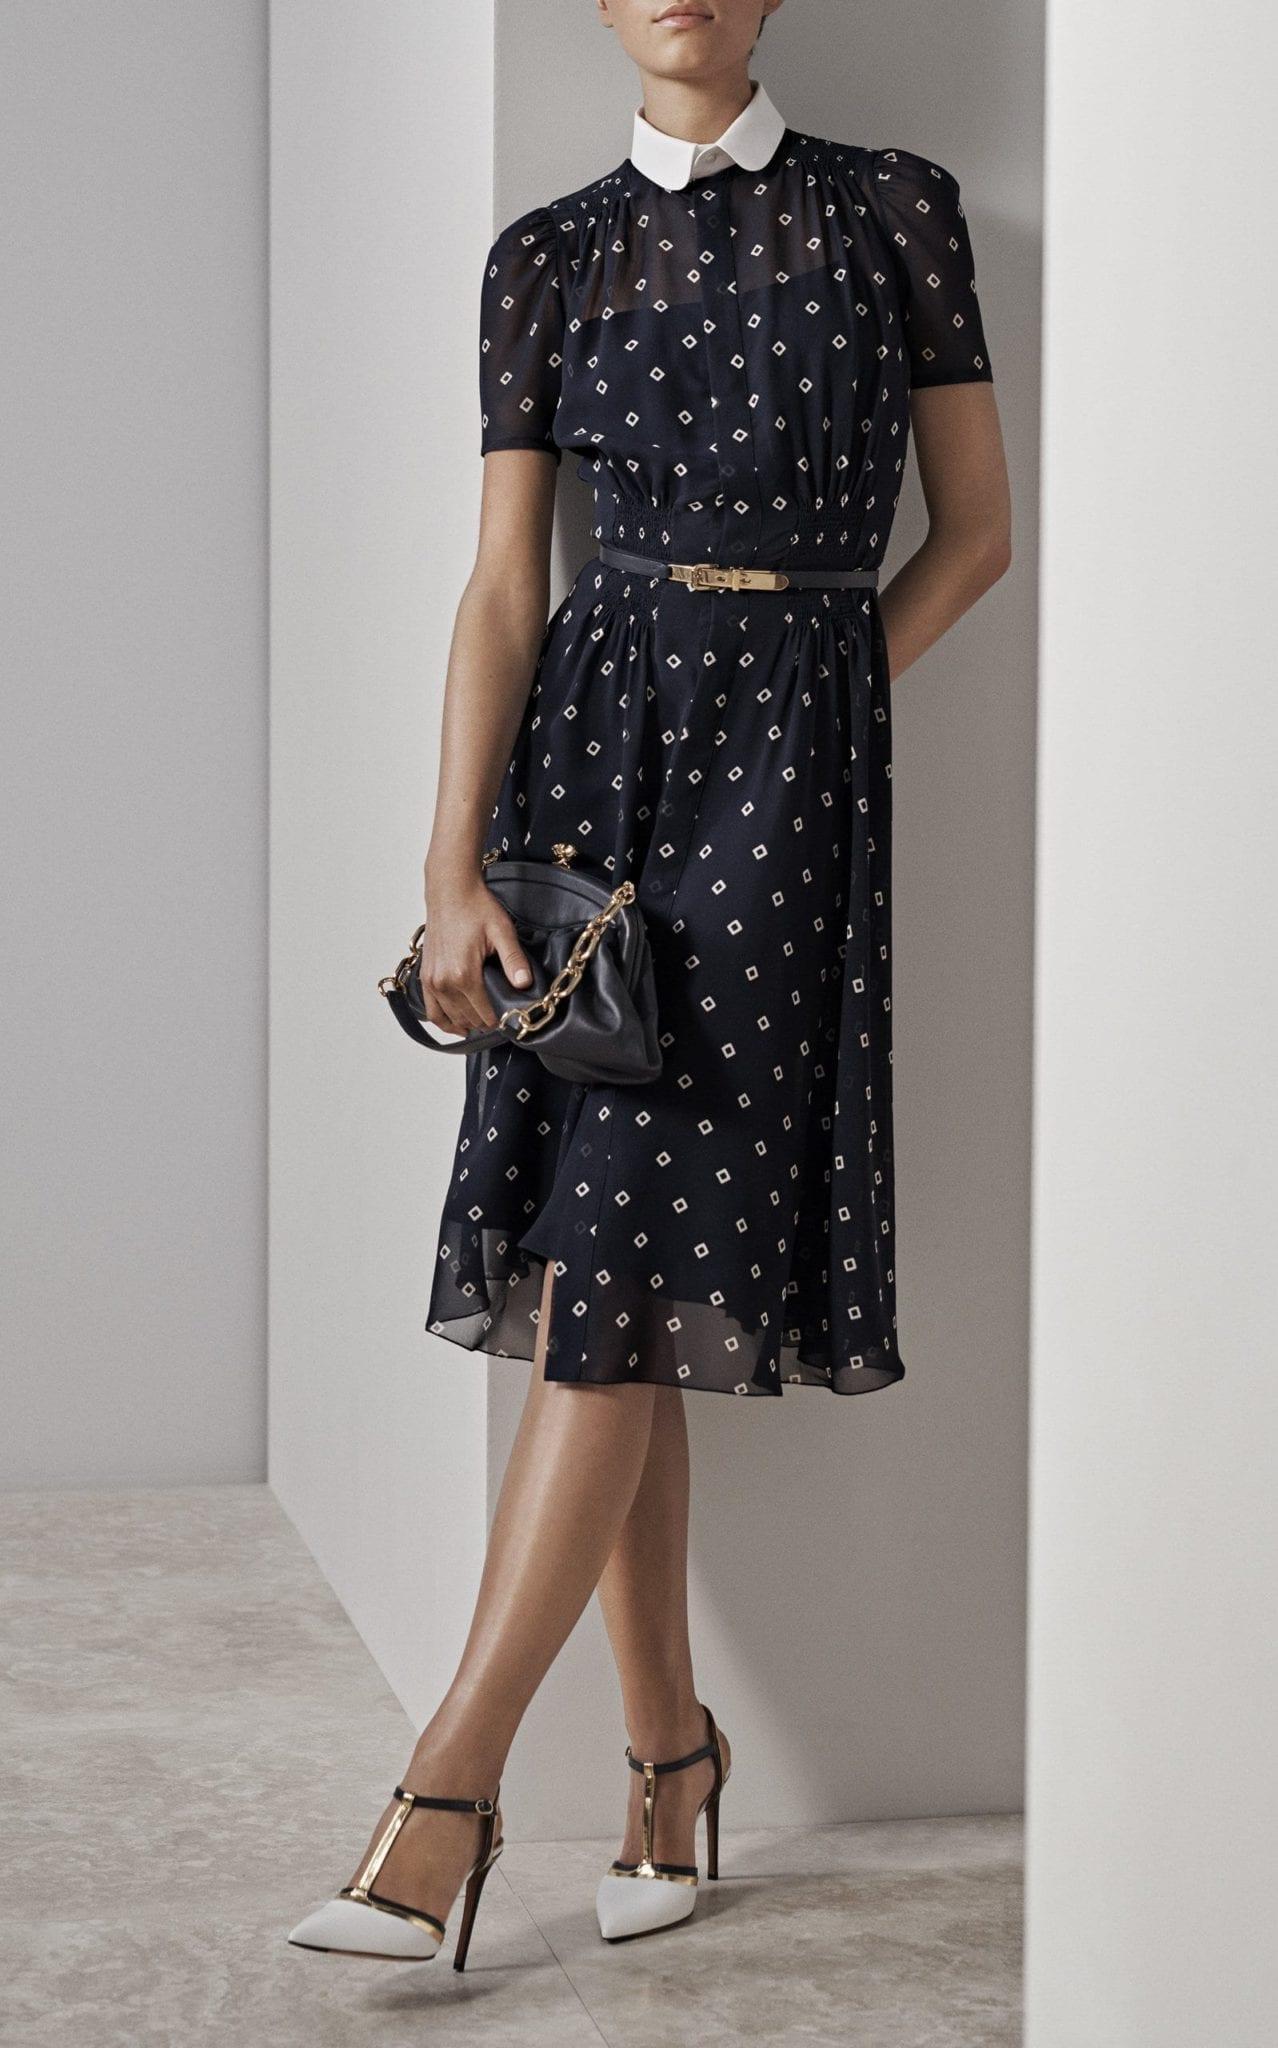 RALPH LAUREN Short Mazie Black / Printed Dress